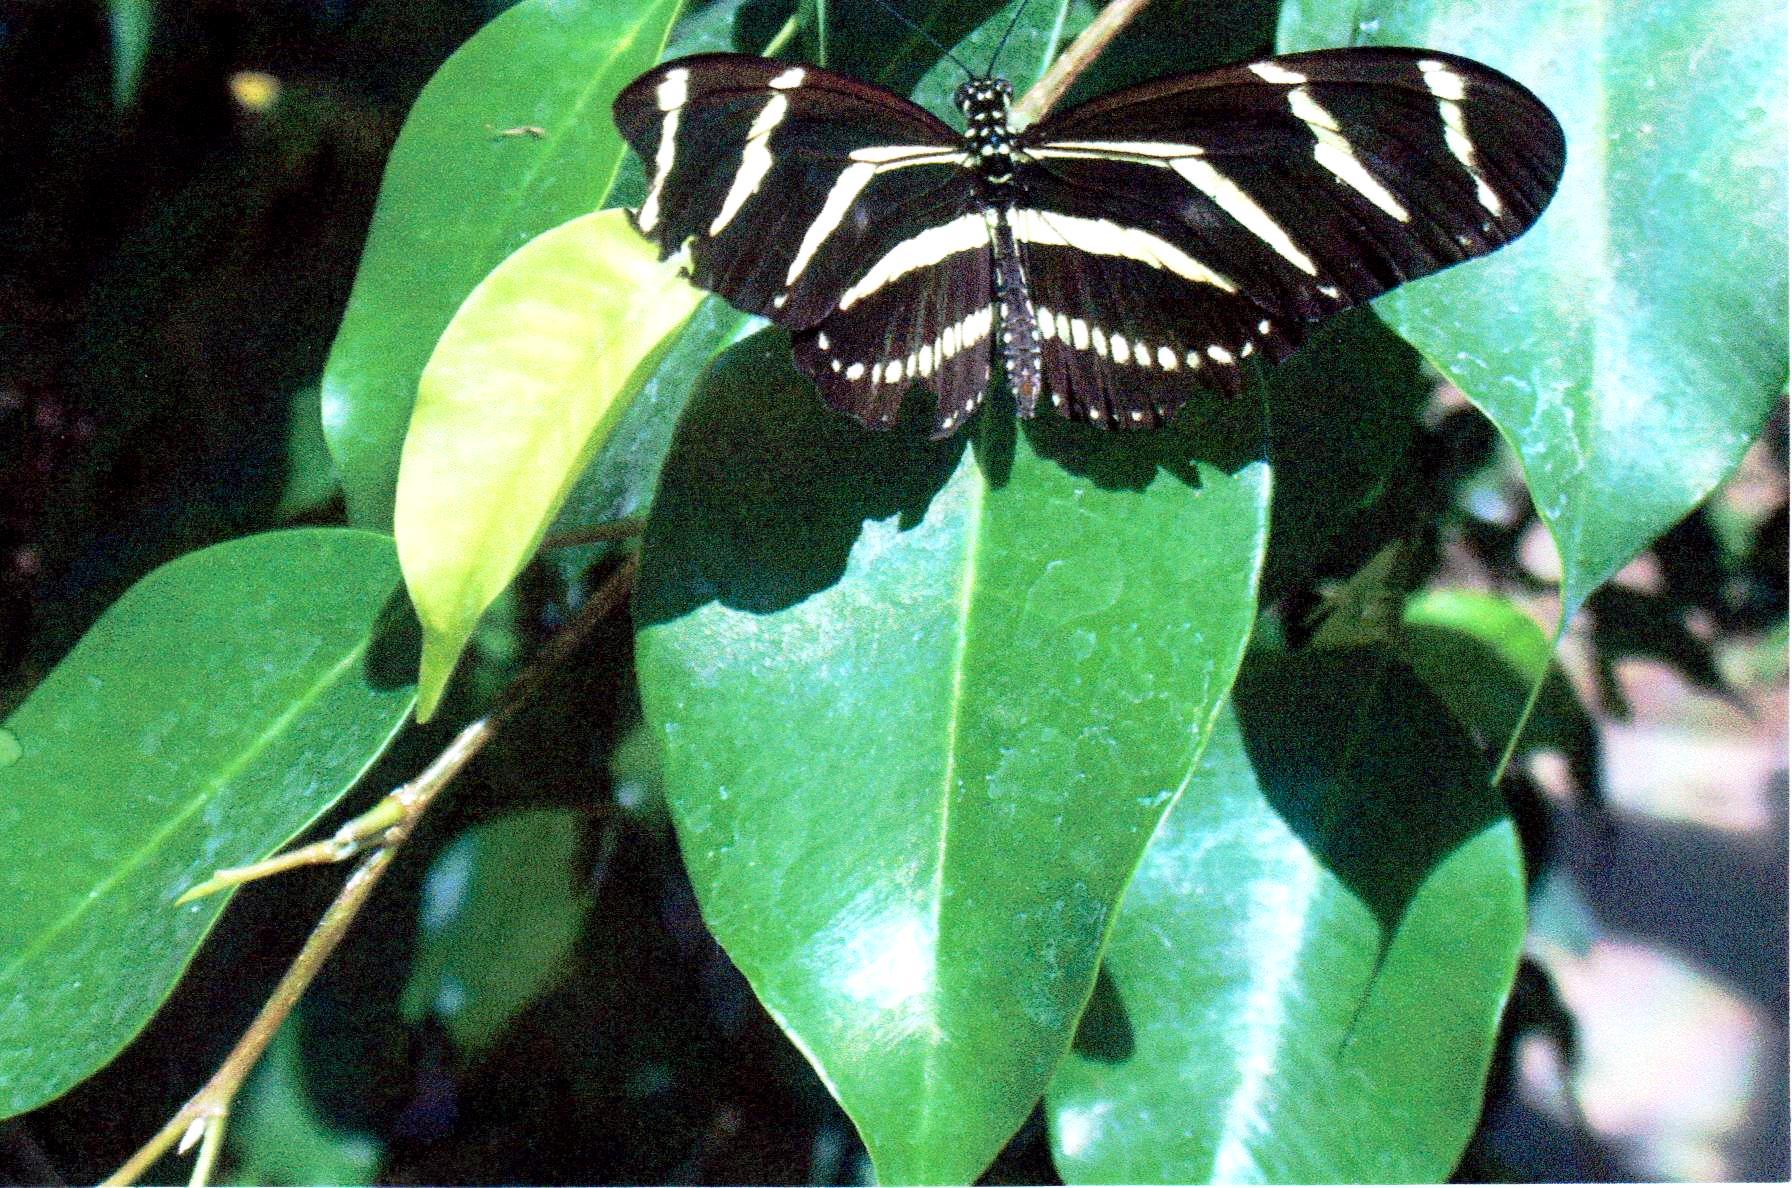 Butteryfly Hogle Zoo 2006 ish.jpg